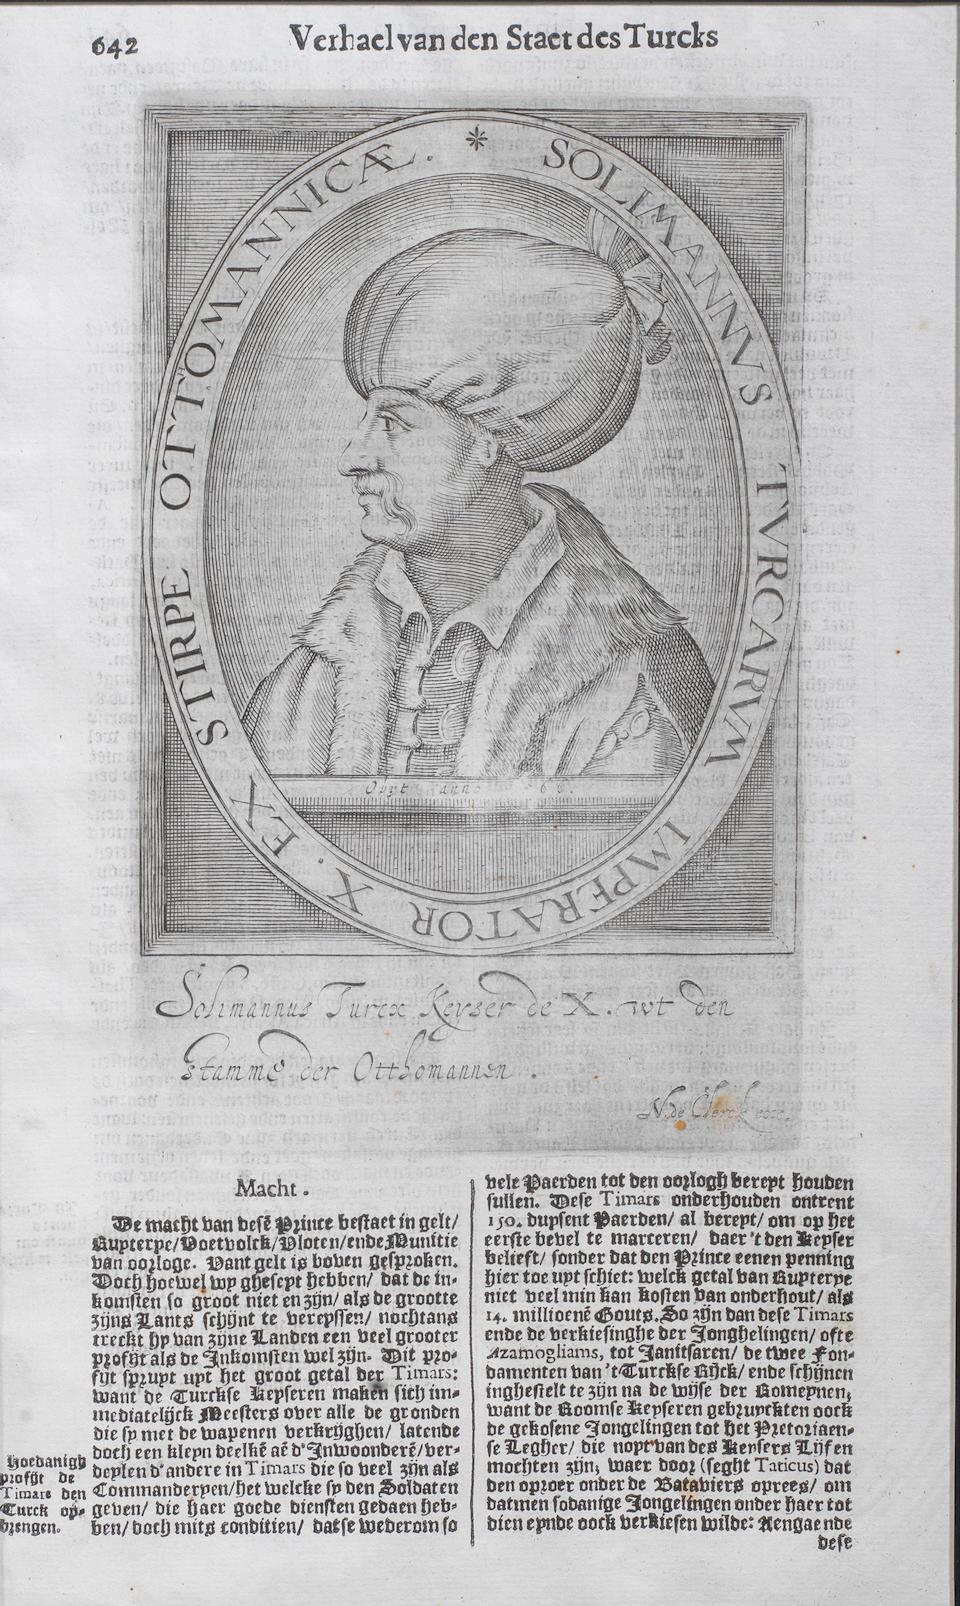 Sultan Suleyman the Magnificent (reg. 1520-66) after Hieronymus Hopfer (1500-63), Augsburg, circa 1530 (2)